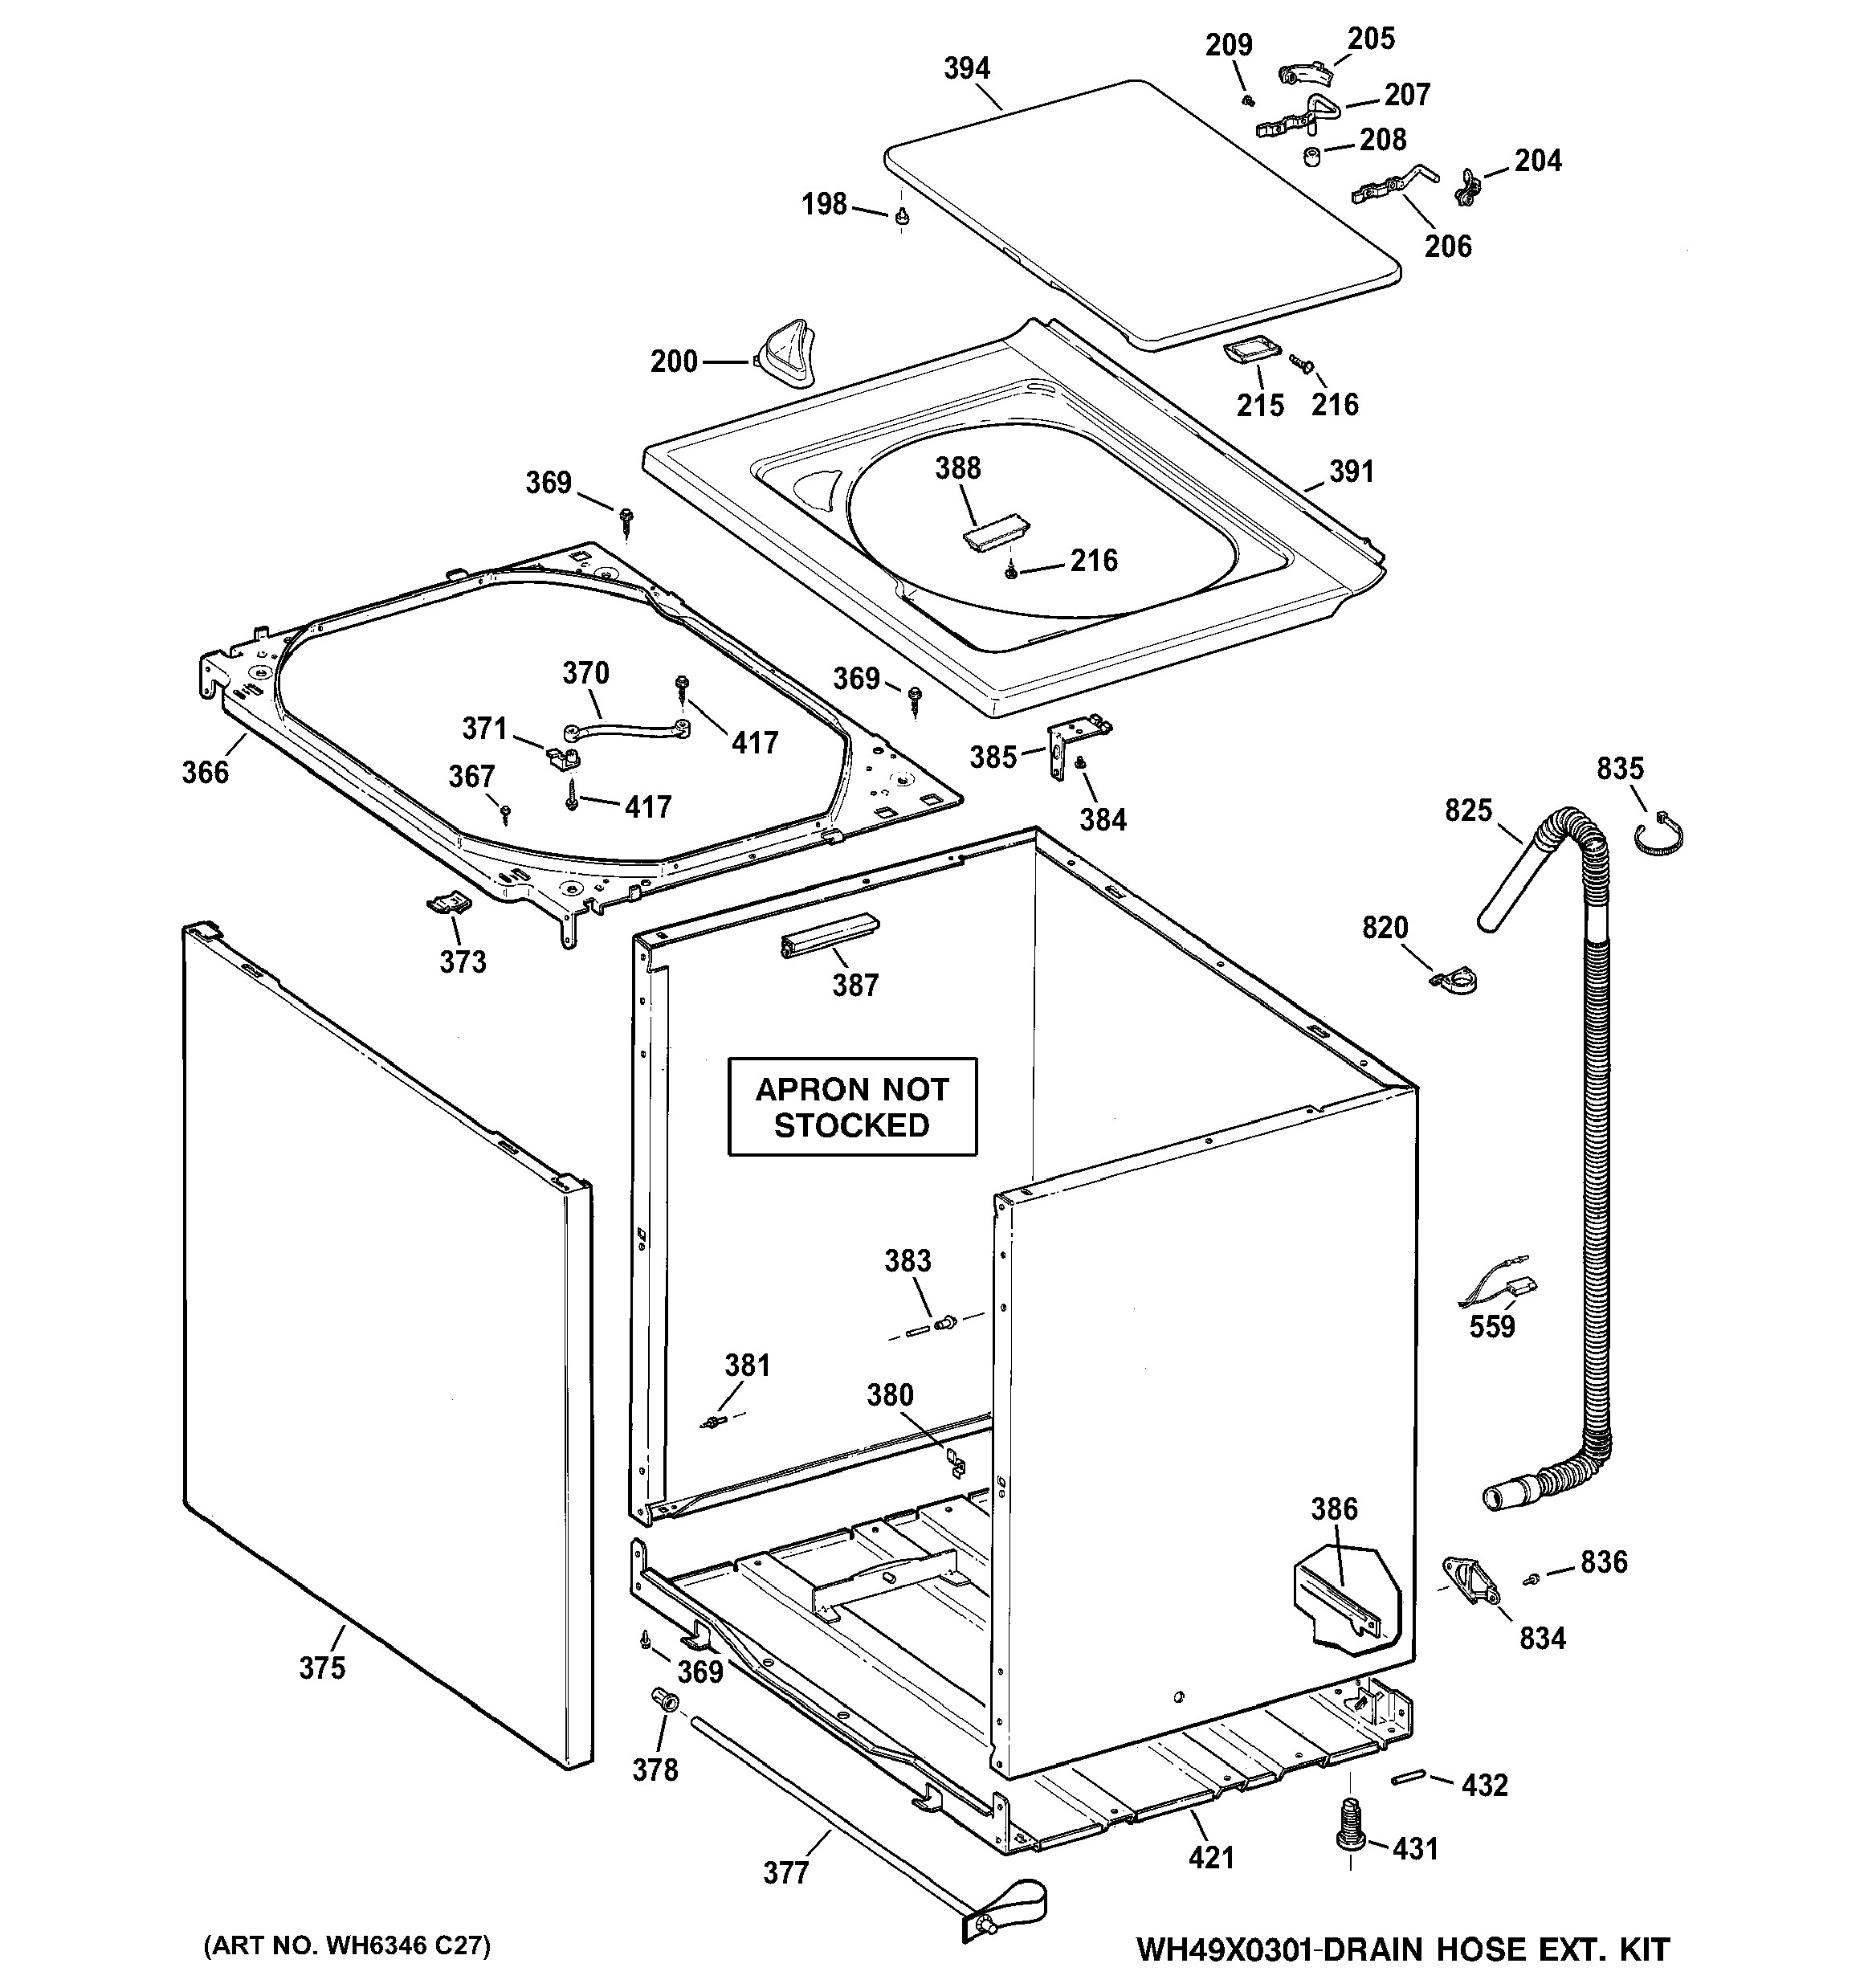 Bosch Dryer Parts Diagram Ge Model Gtw180scj0ww Residential Washers Genuine Parts Of Bosch Dryer Parts Diagram